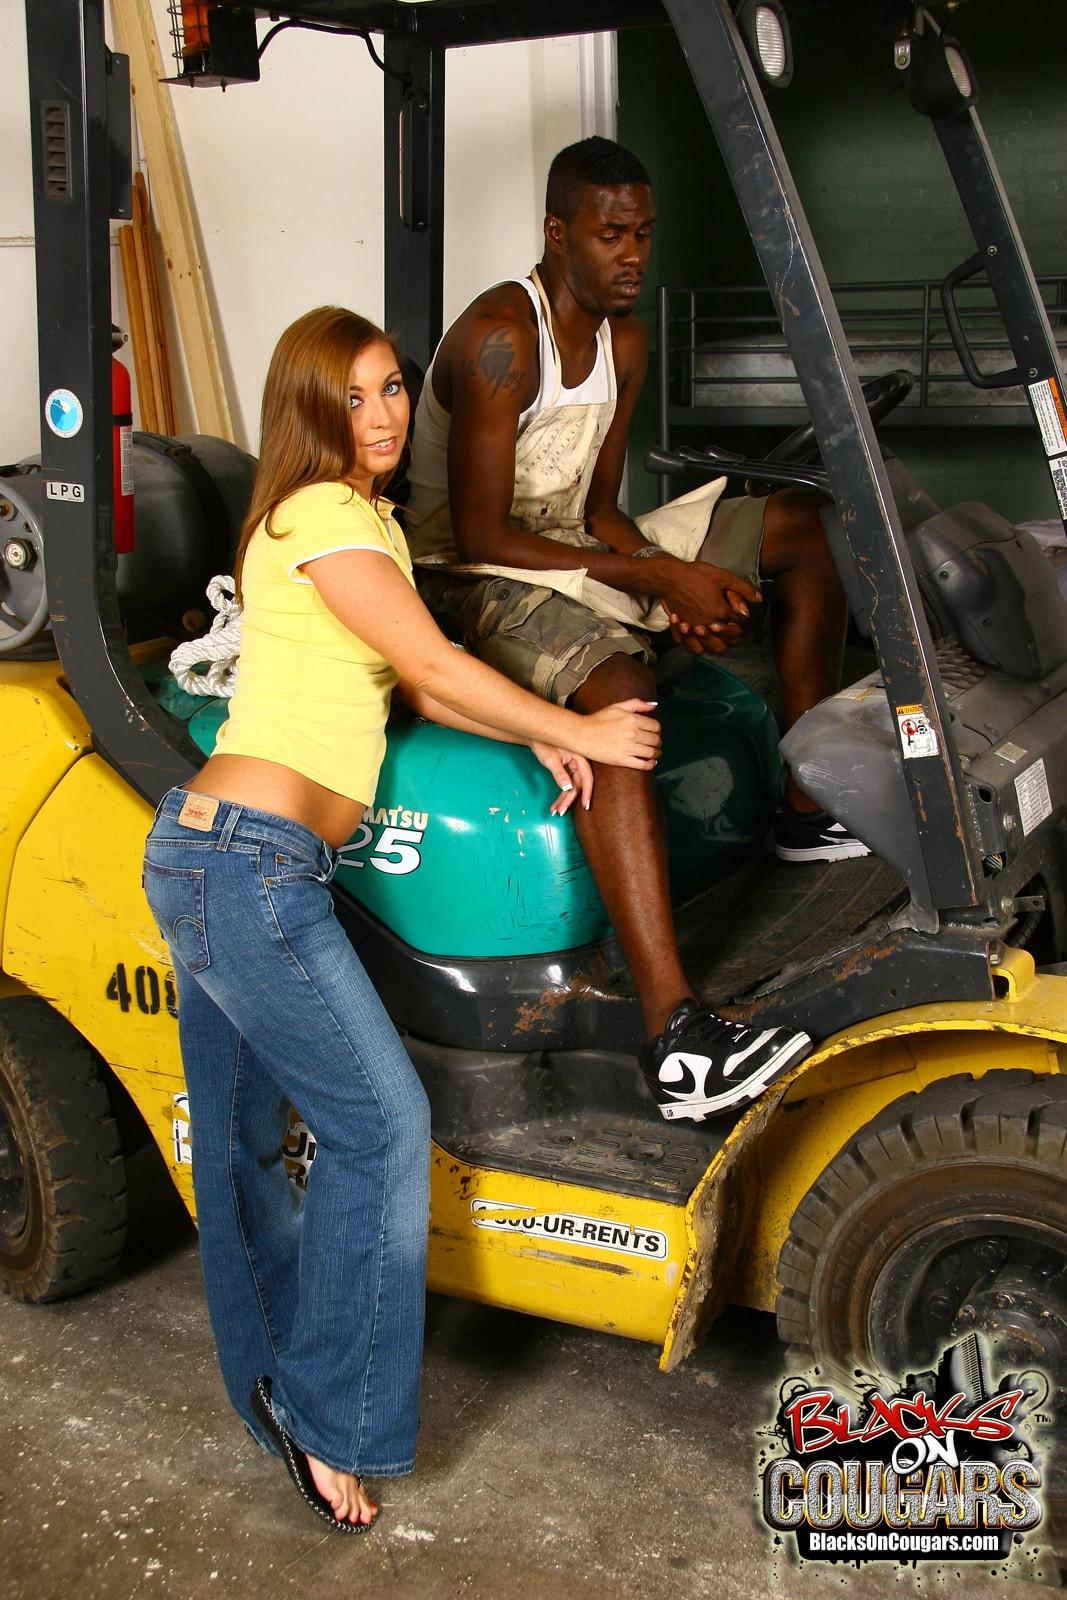 Dogfart '- Blacks On Cougars' starring Honey White (Photo 2)